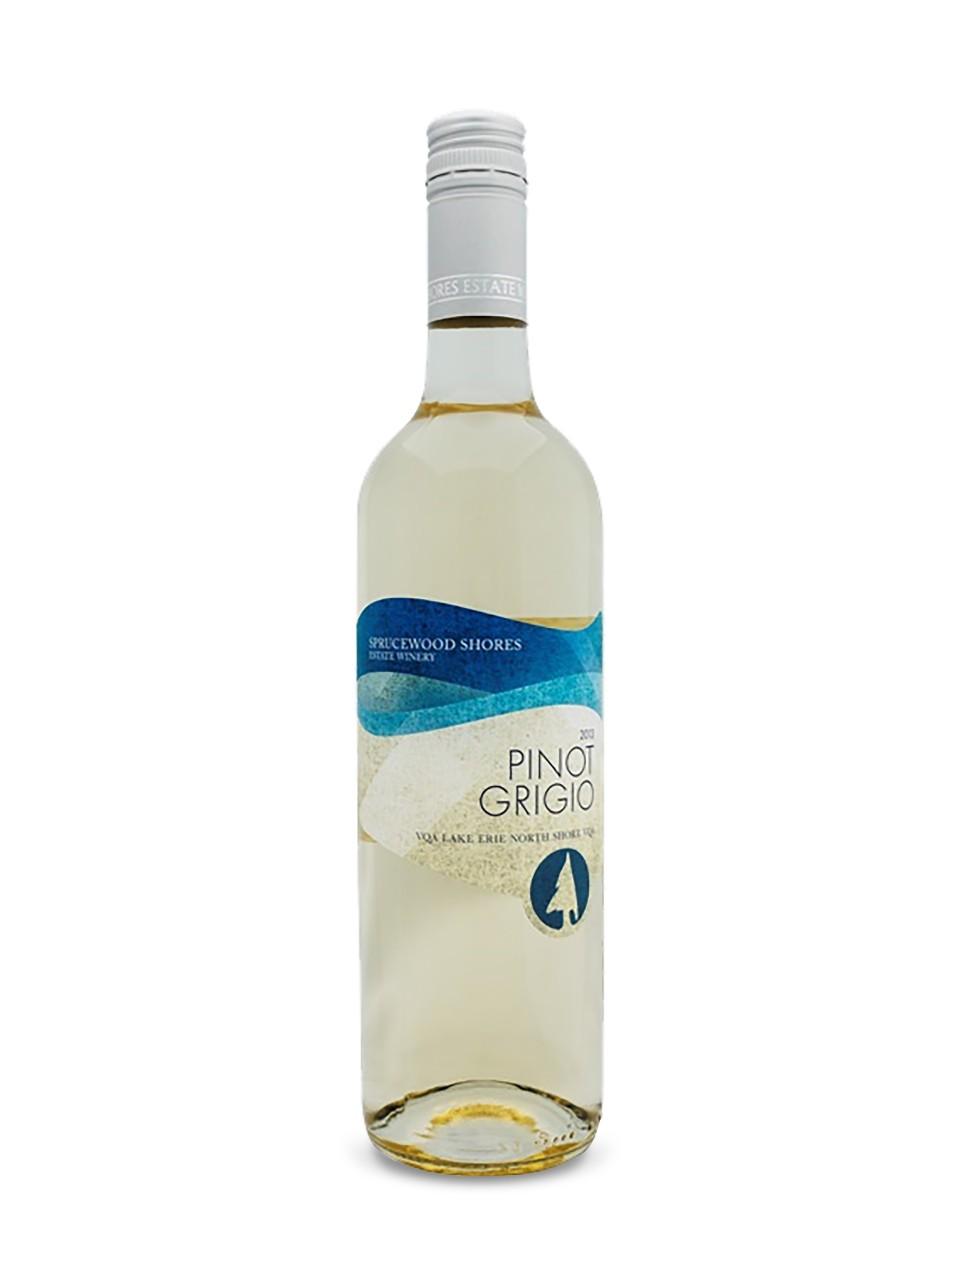 Wine of the WeekendSprucewood Shores Estate Winery Pinot Grigio 2016 VQA Ontario